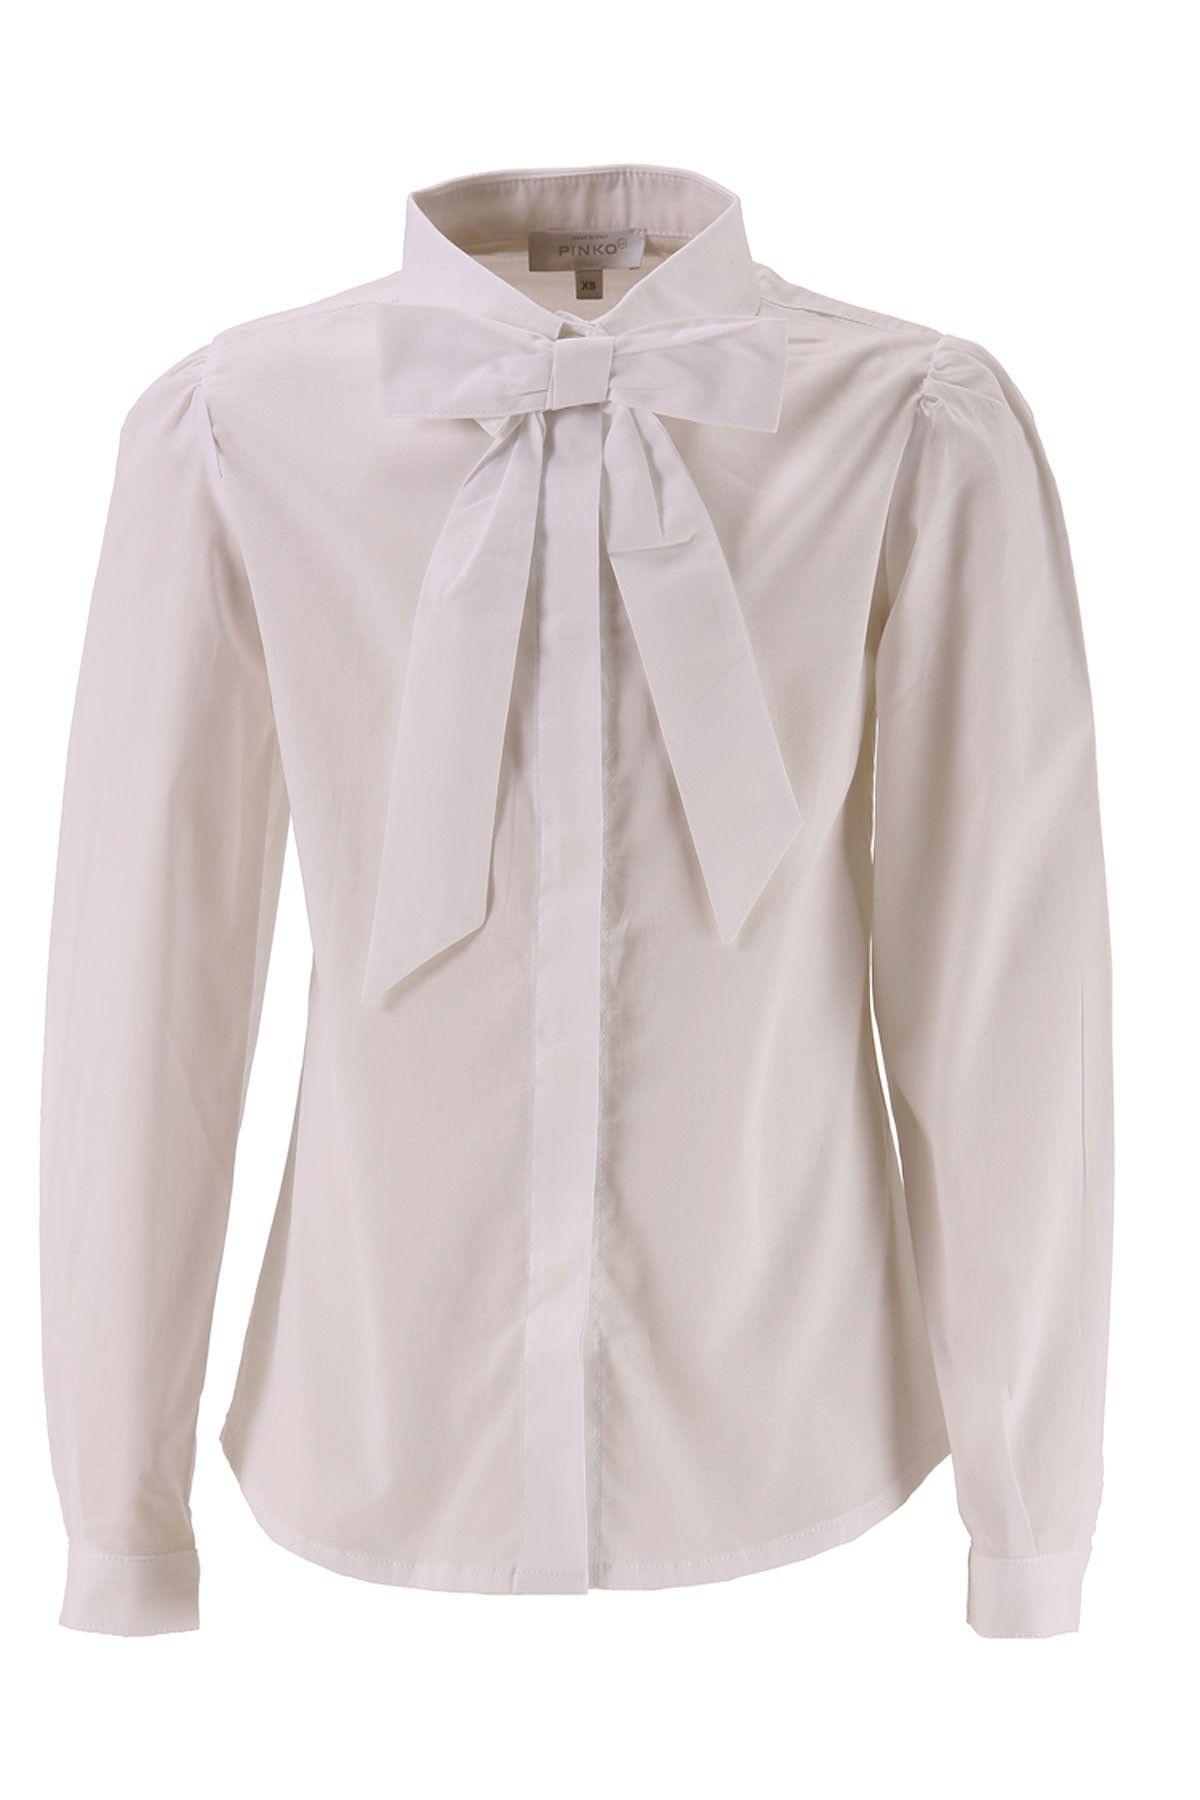 5837374ad9 PINKO UP CAMICIA MARIUCCIA | PINKO UP CLOTHES | Ruffle blouse ...